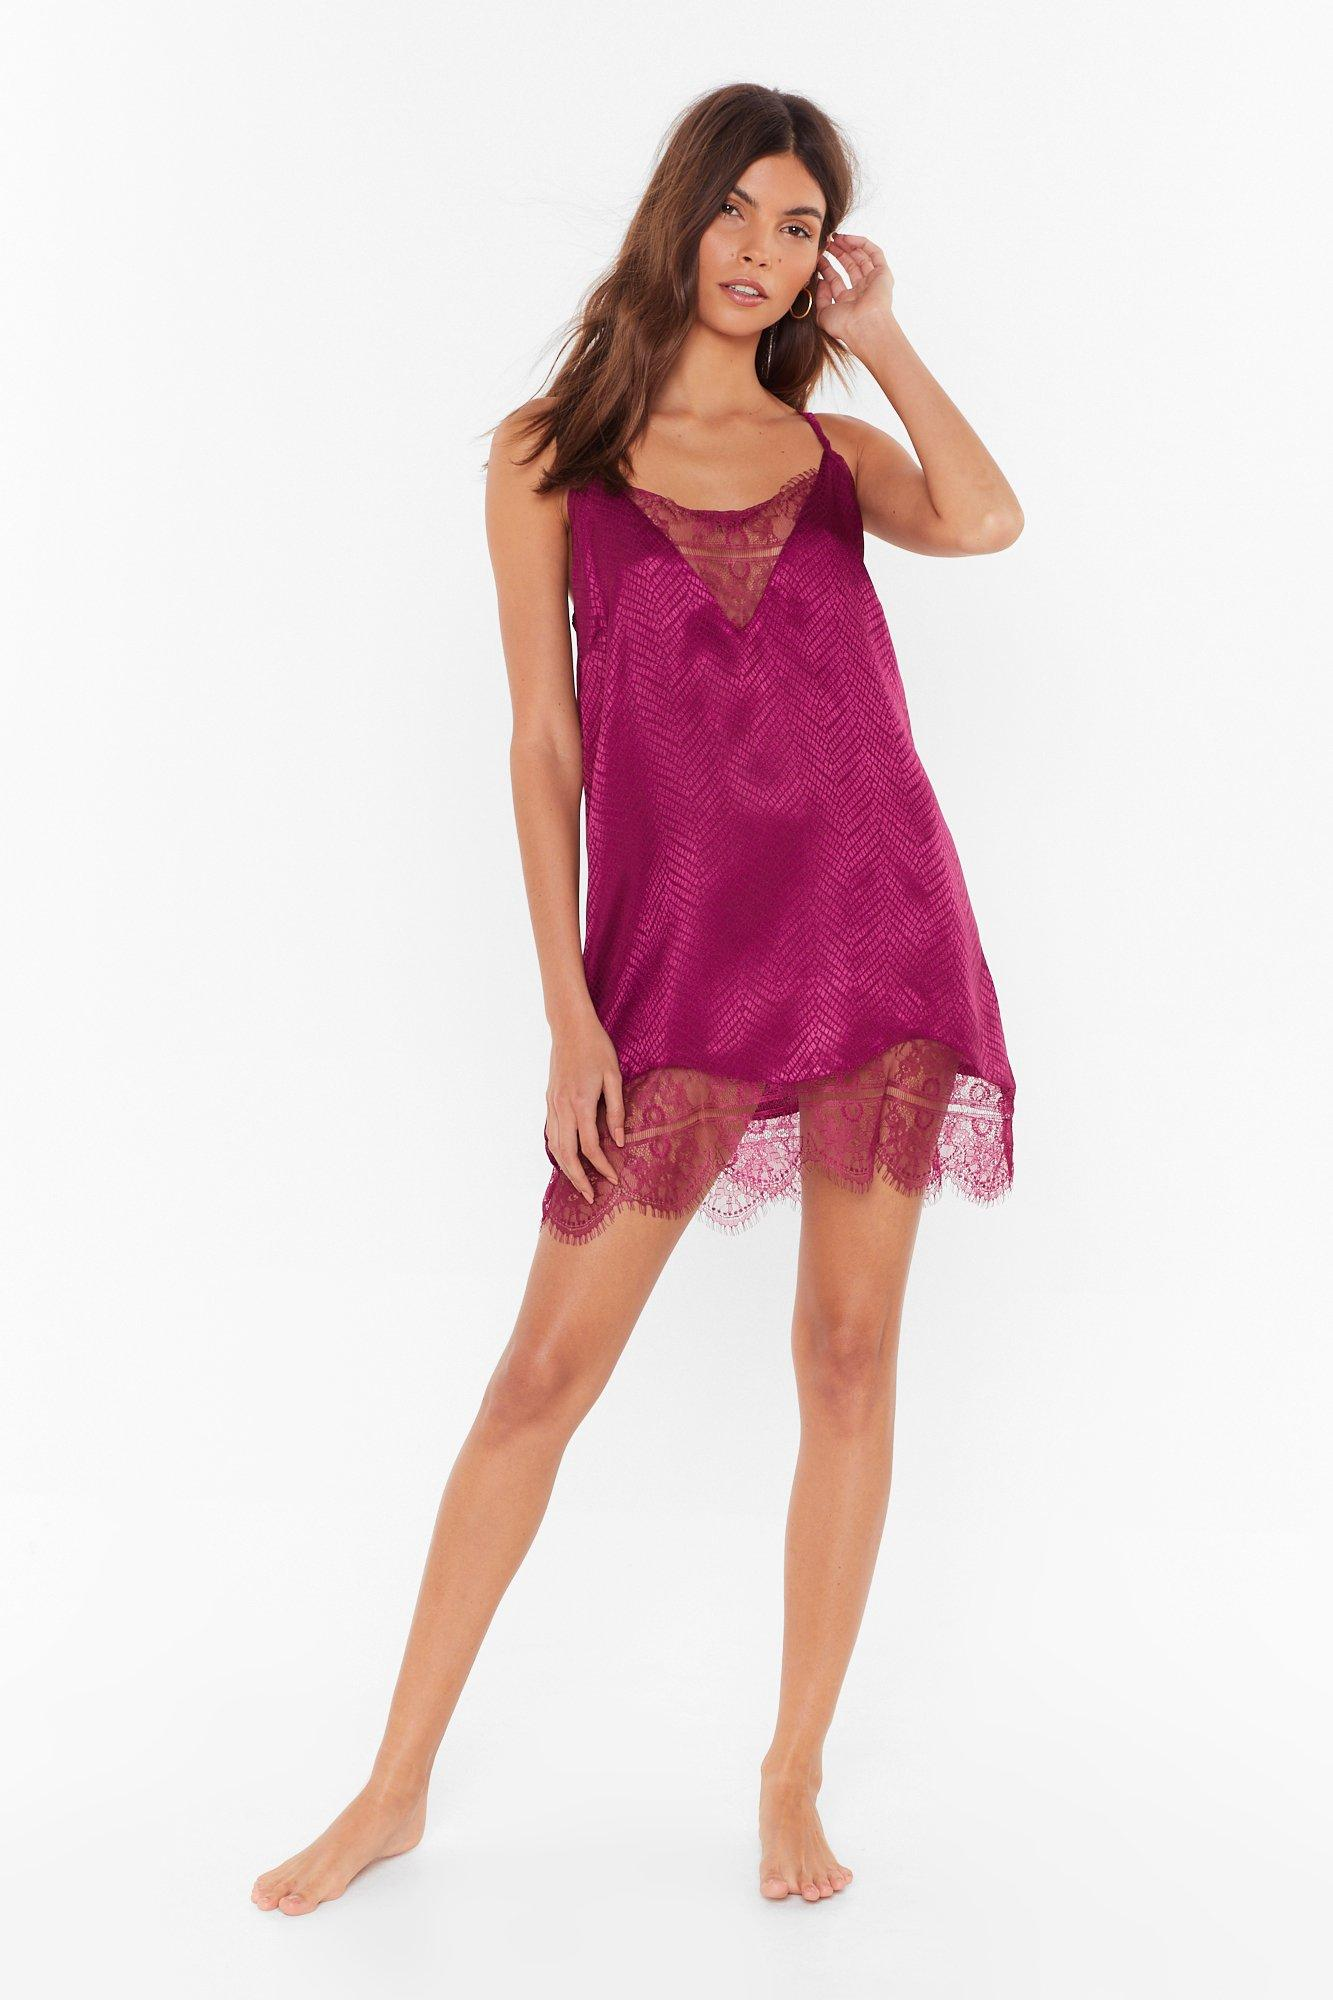 Image of Not Sleeking Alone Lace Jacquard Nightie